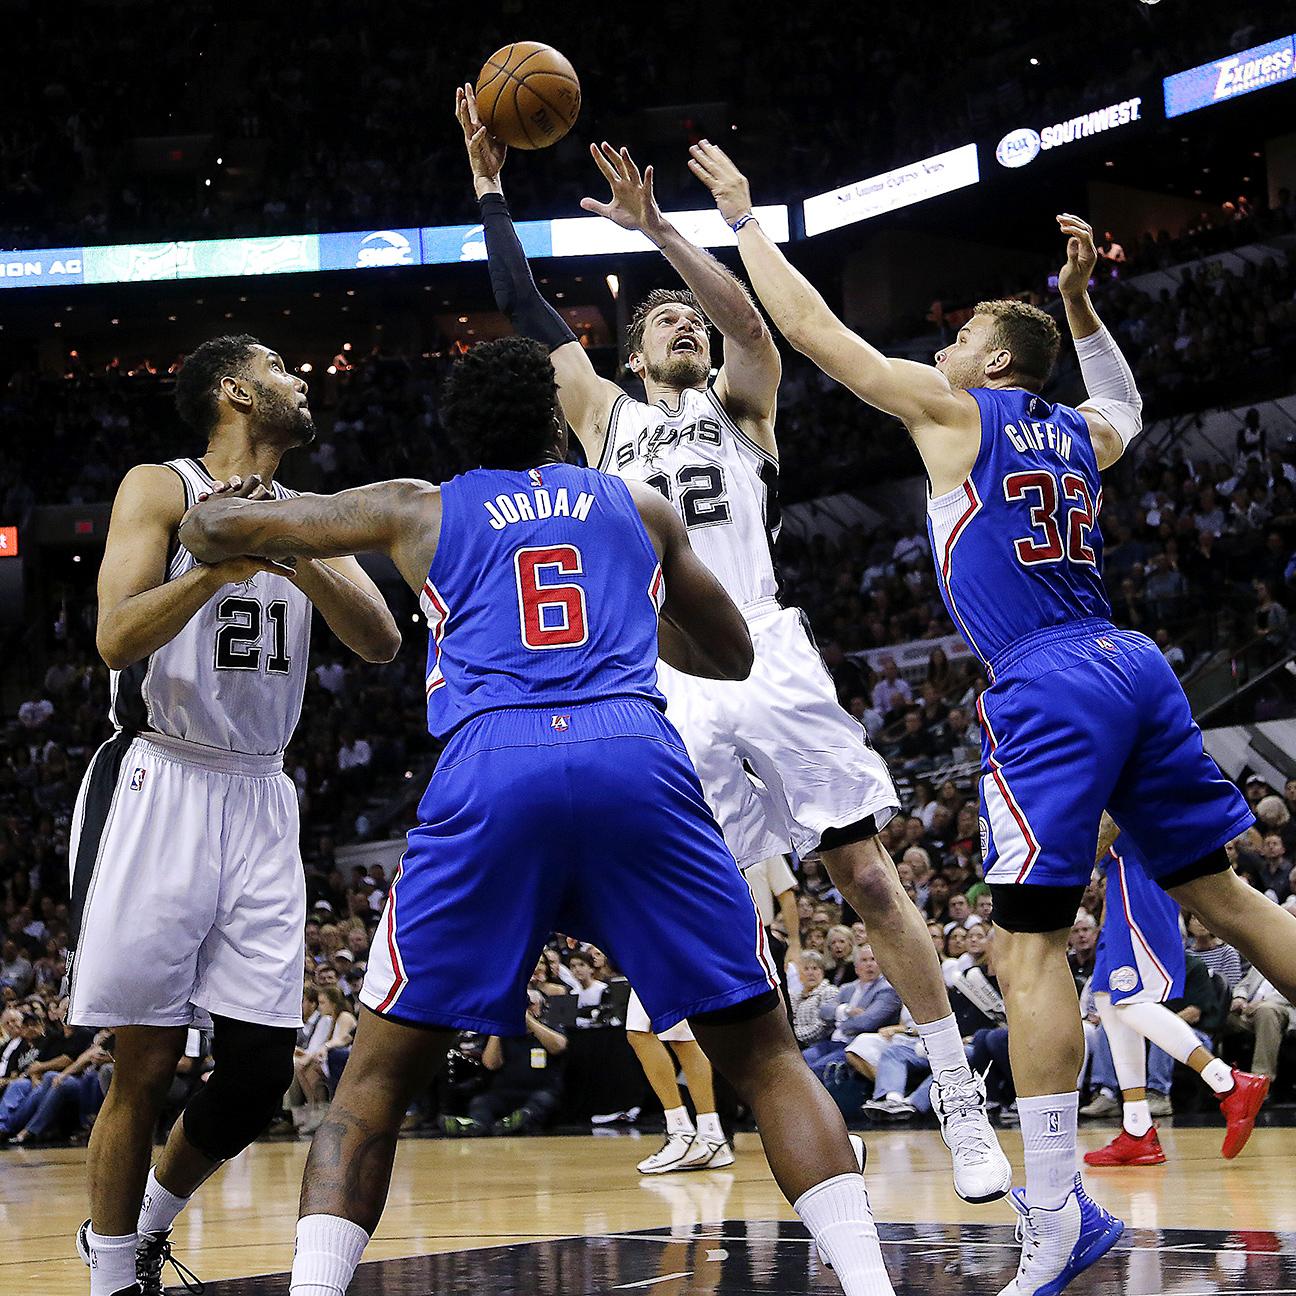 Report: Hawks finalizing trade for Spurs' Splitter